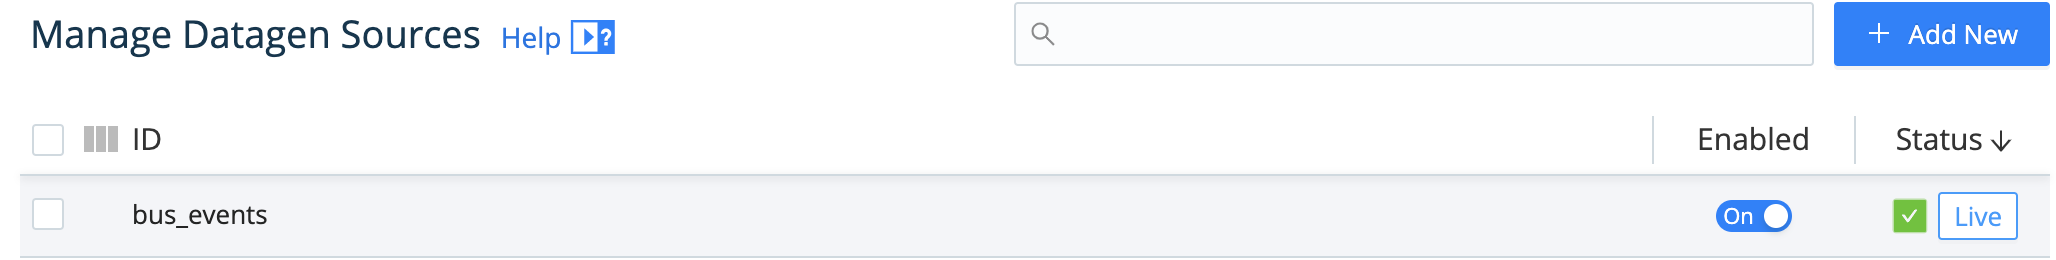 Source > Live button